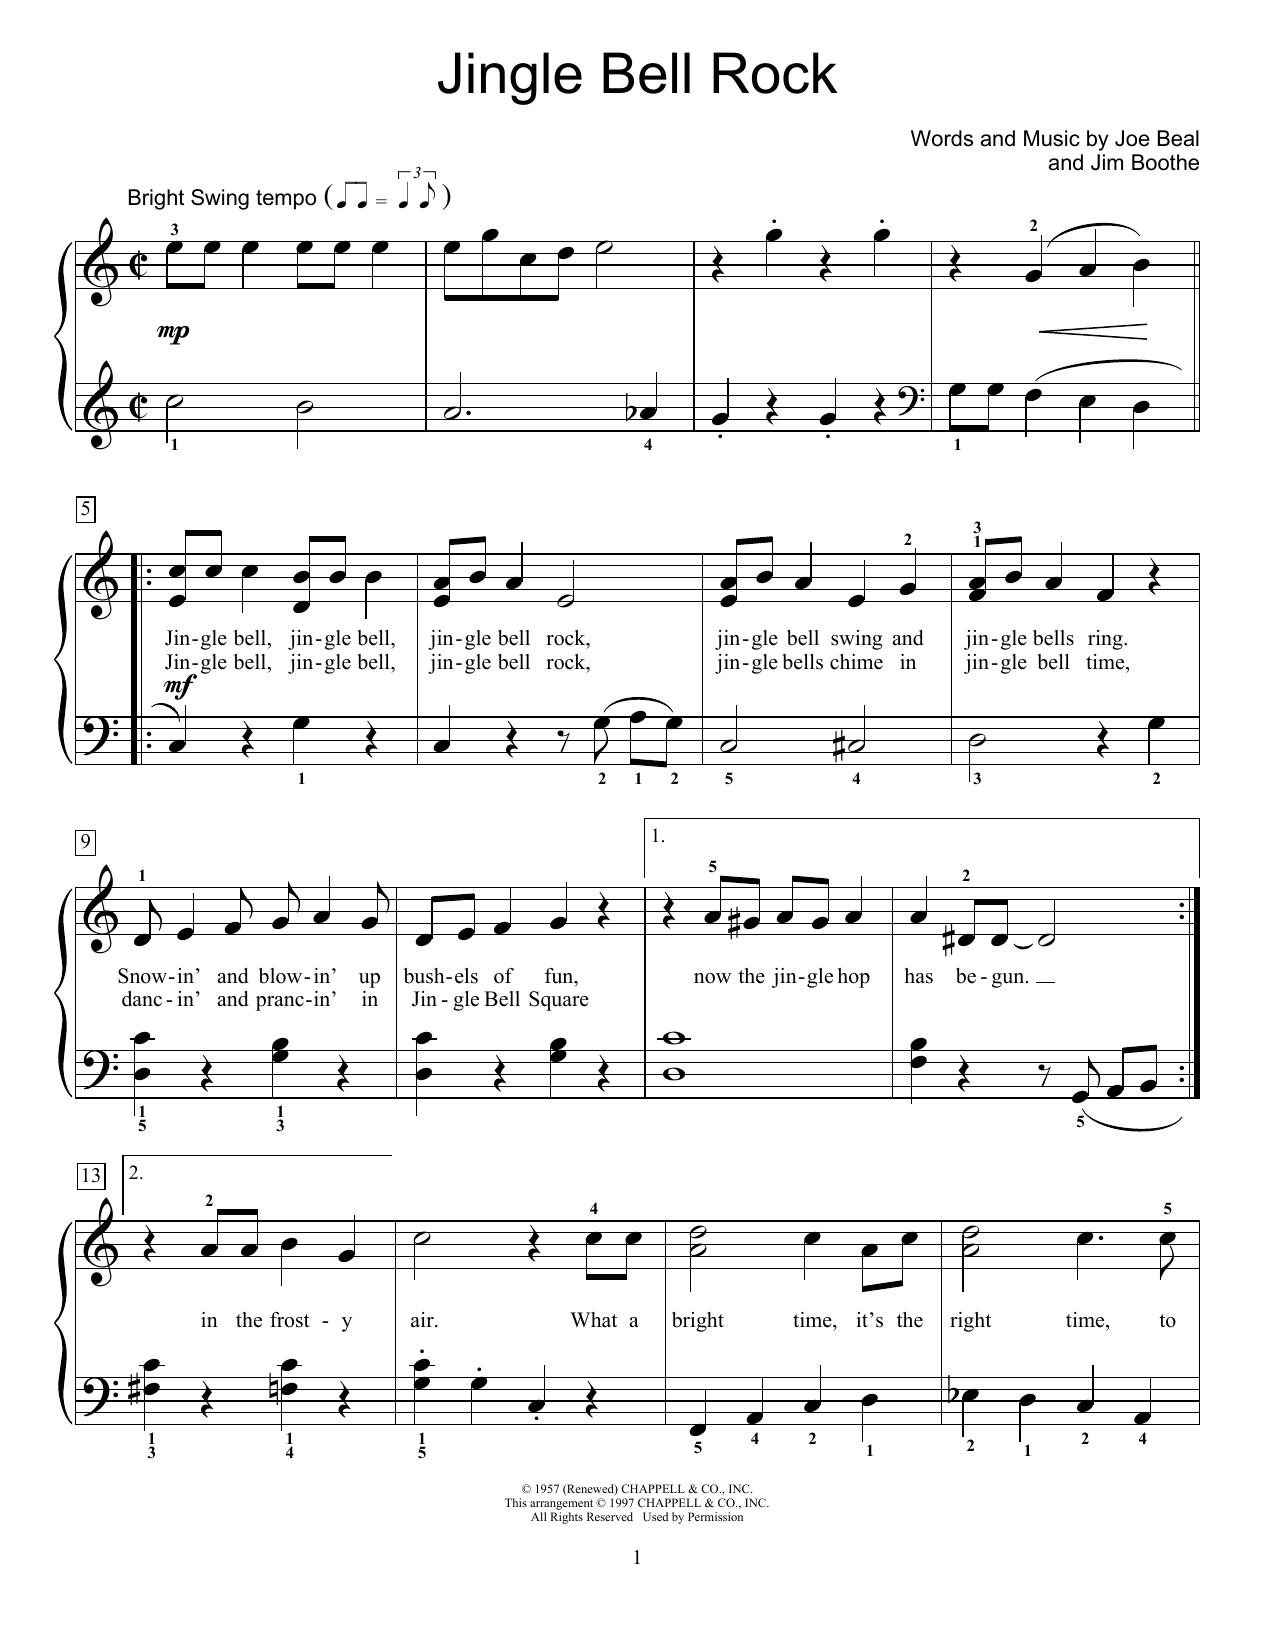 jingle bell rock music sheet pdf